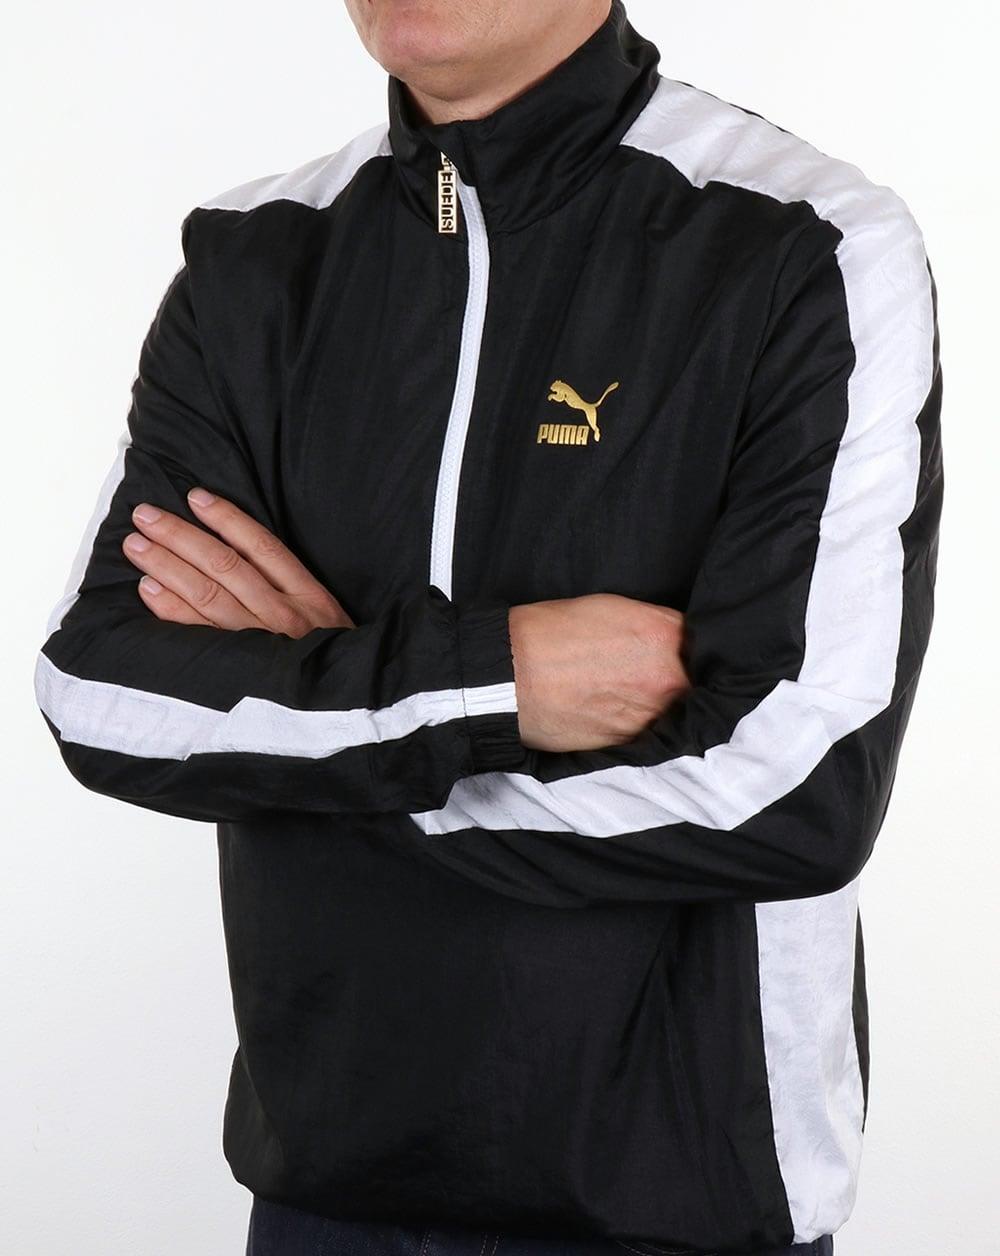 PUMA Savannah Jacket